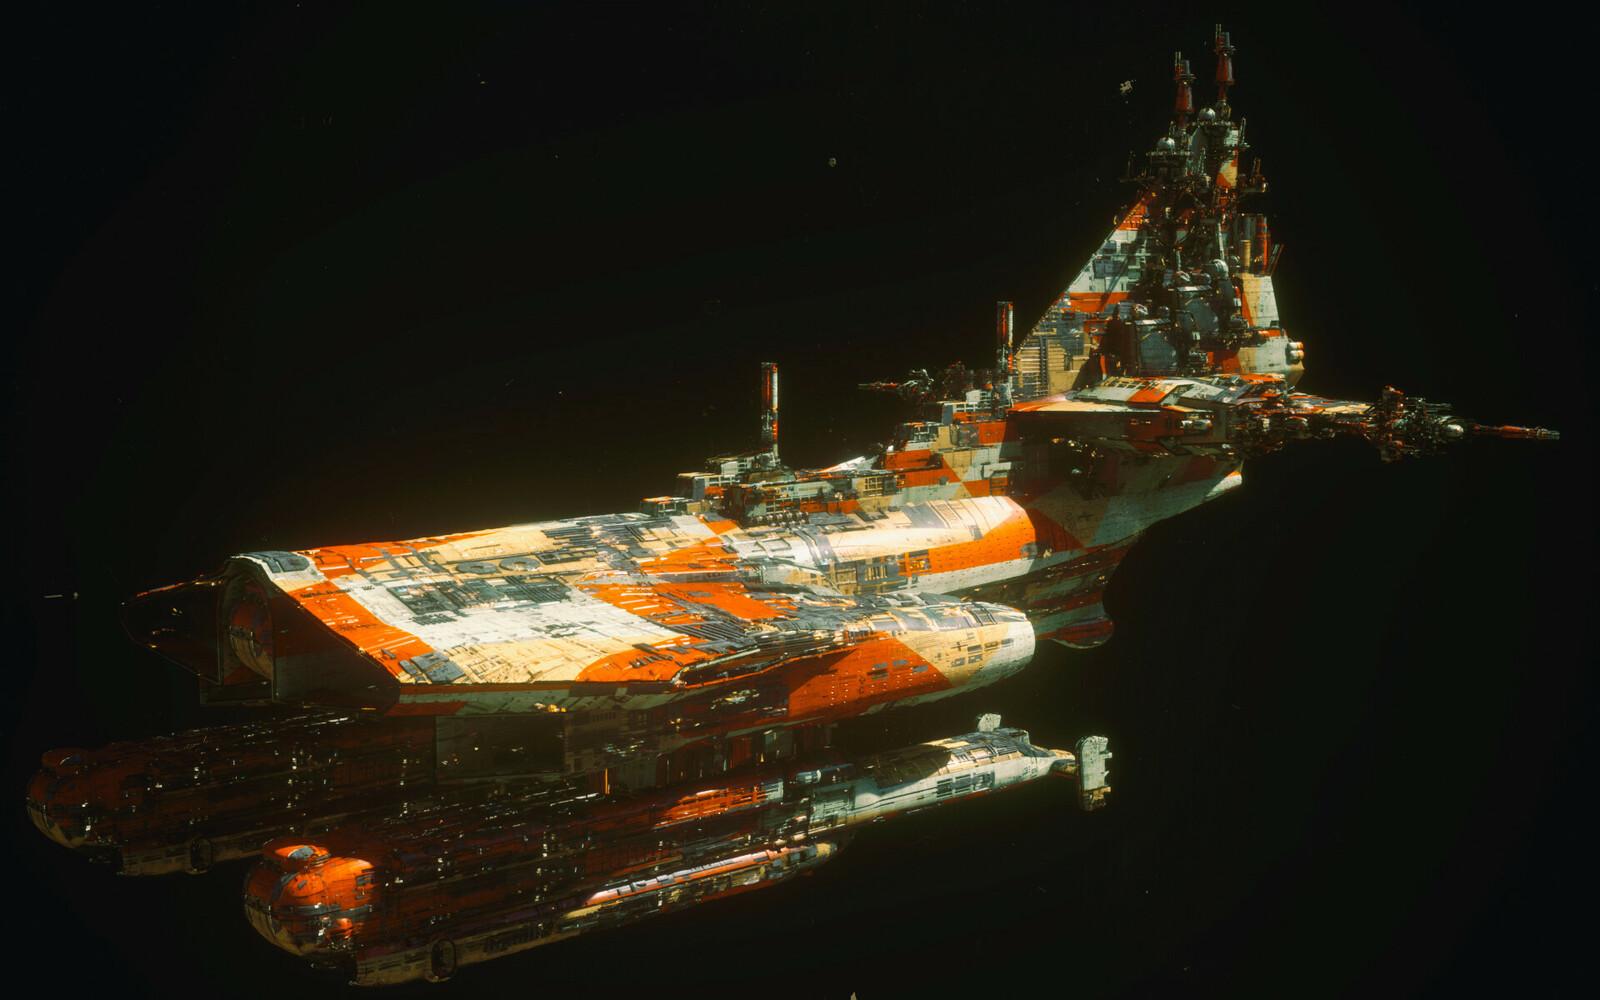 Manta Shuttle Carrier